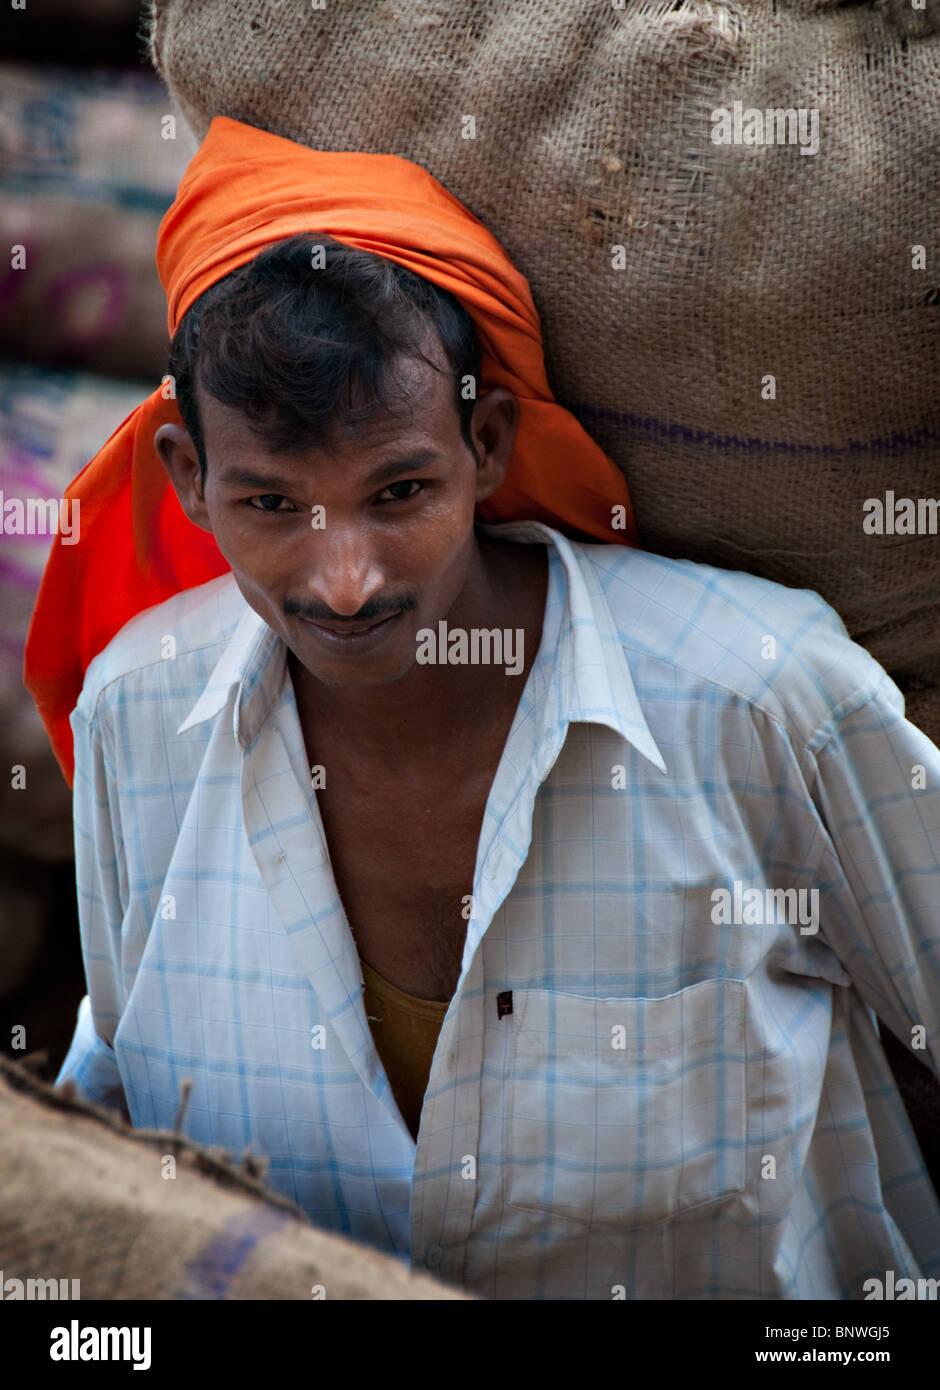 Market Worker moving Potato Sacks - Stock Image